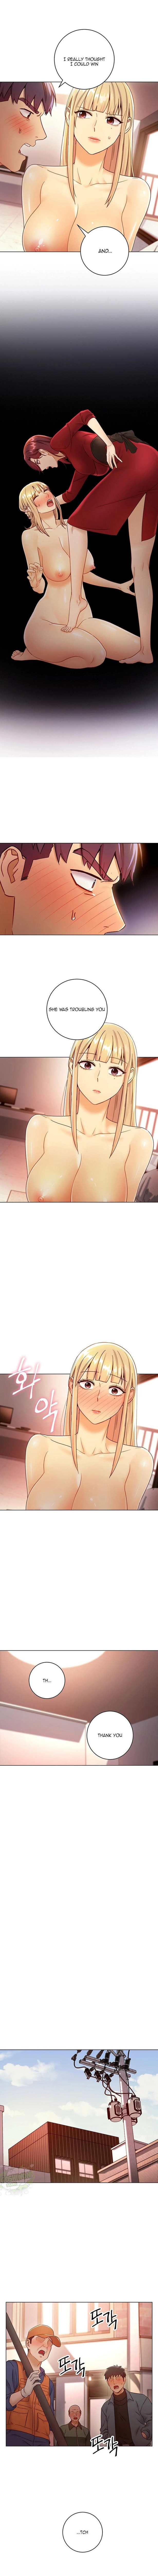 [Neck Pilllow] Stepmother Friends Ch.40/? [English] [Hentai Universe] NEW! 22/10/2020 394